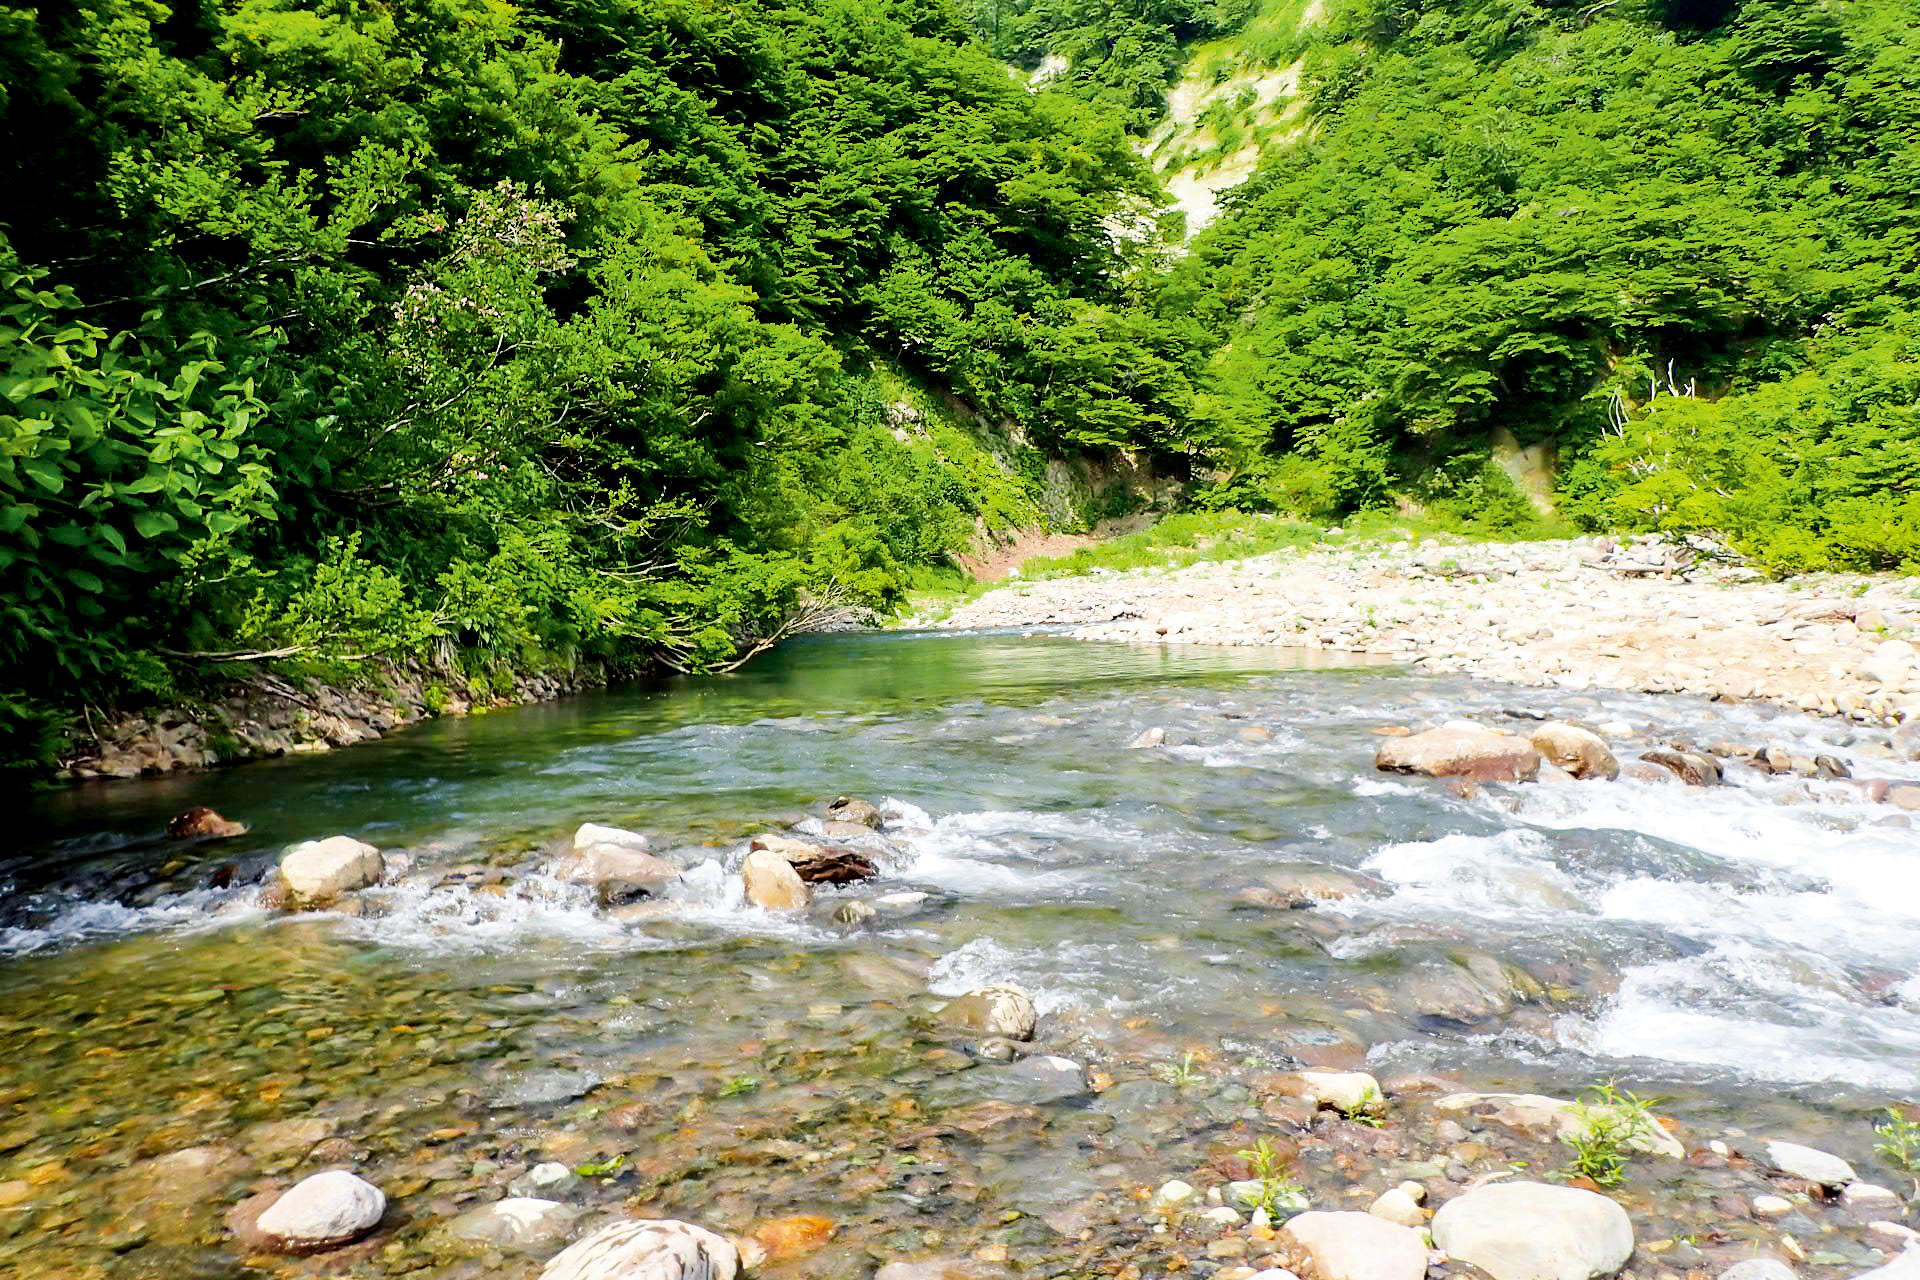 Yoshigahira Recreation Area